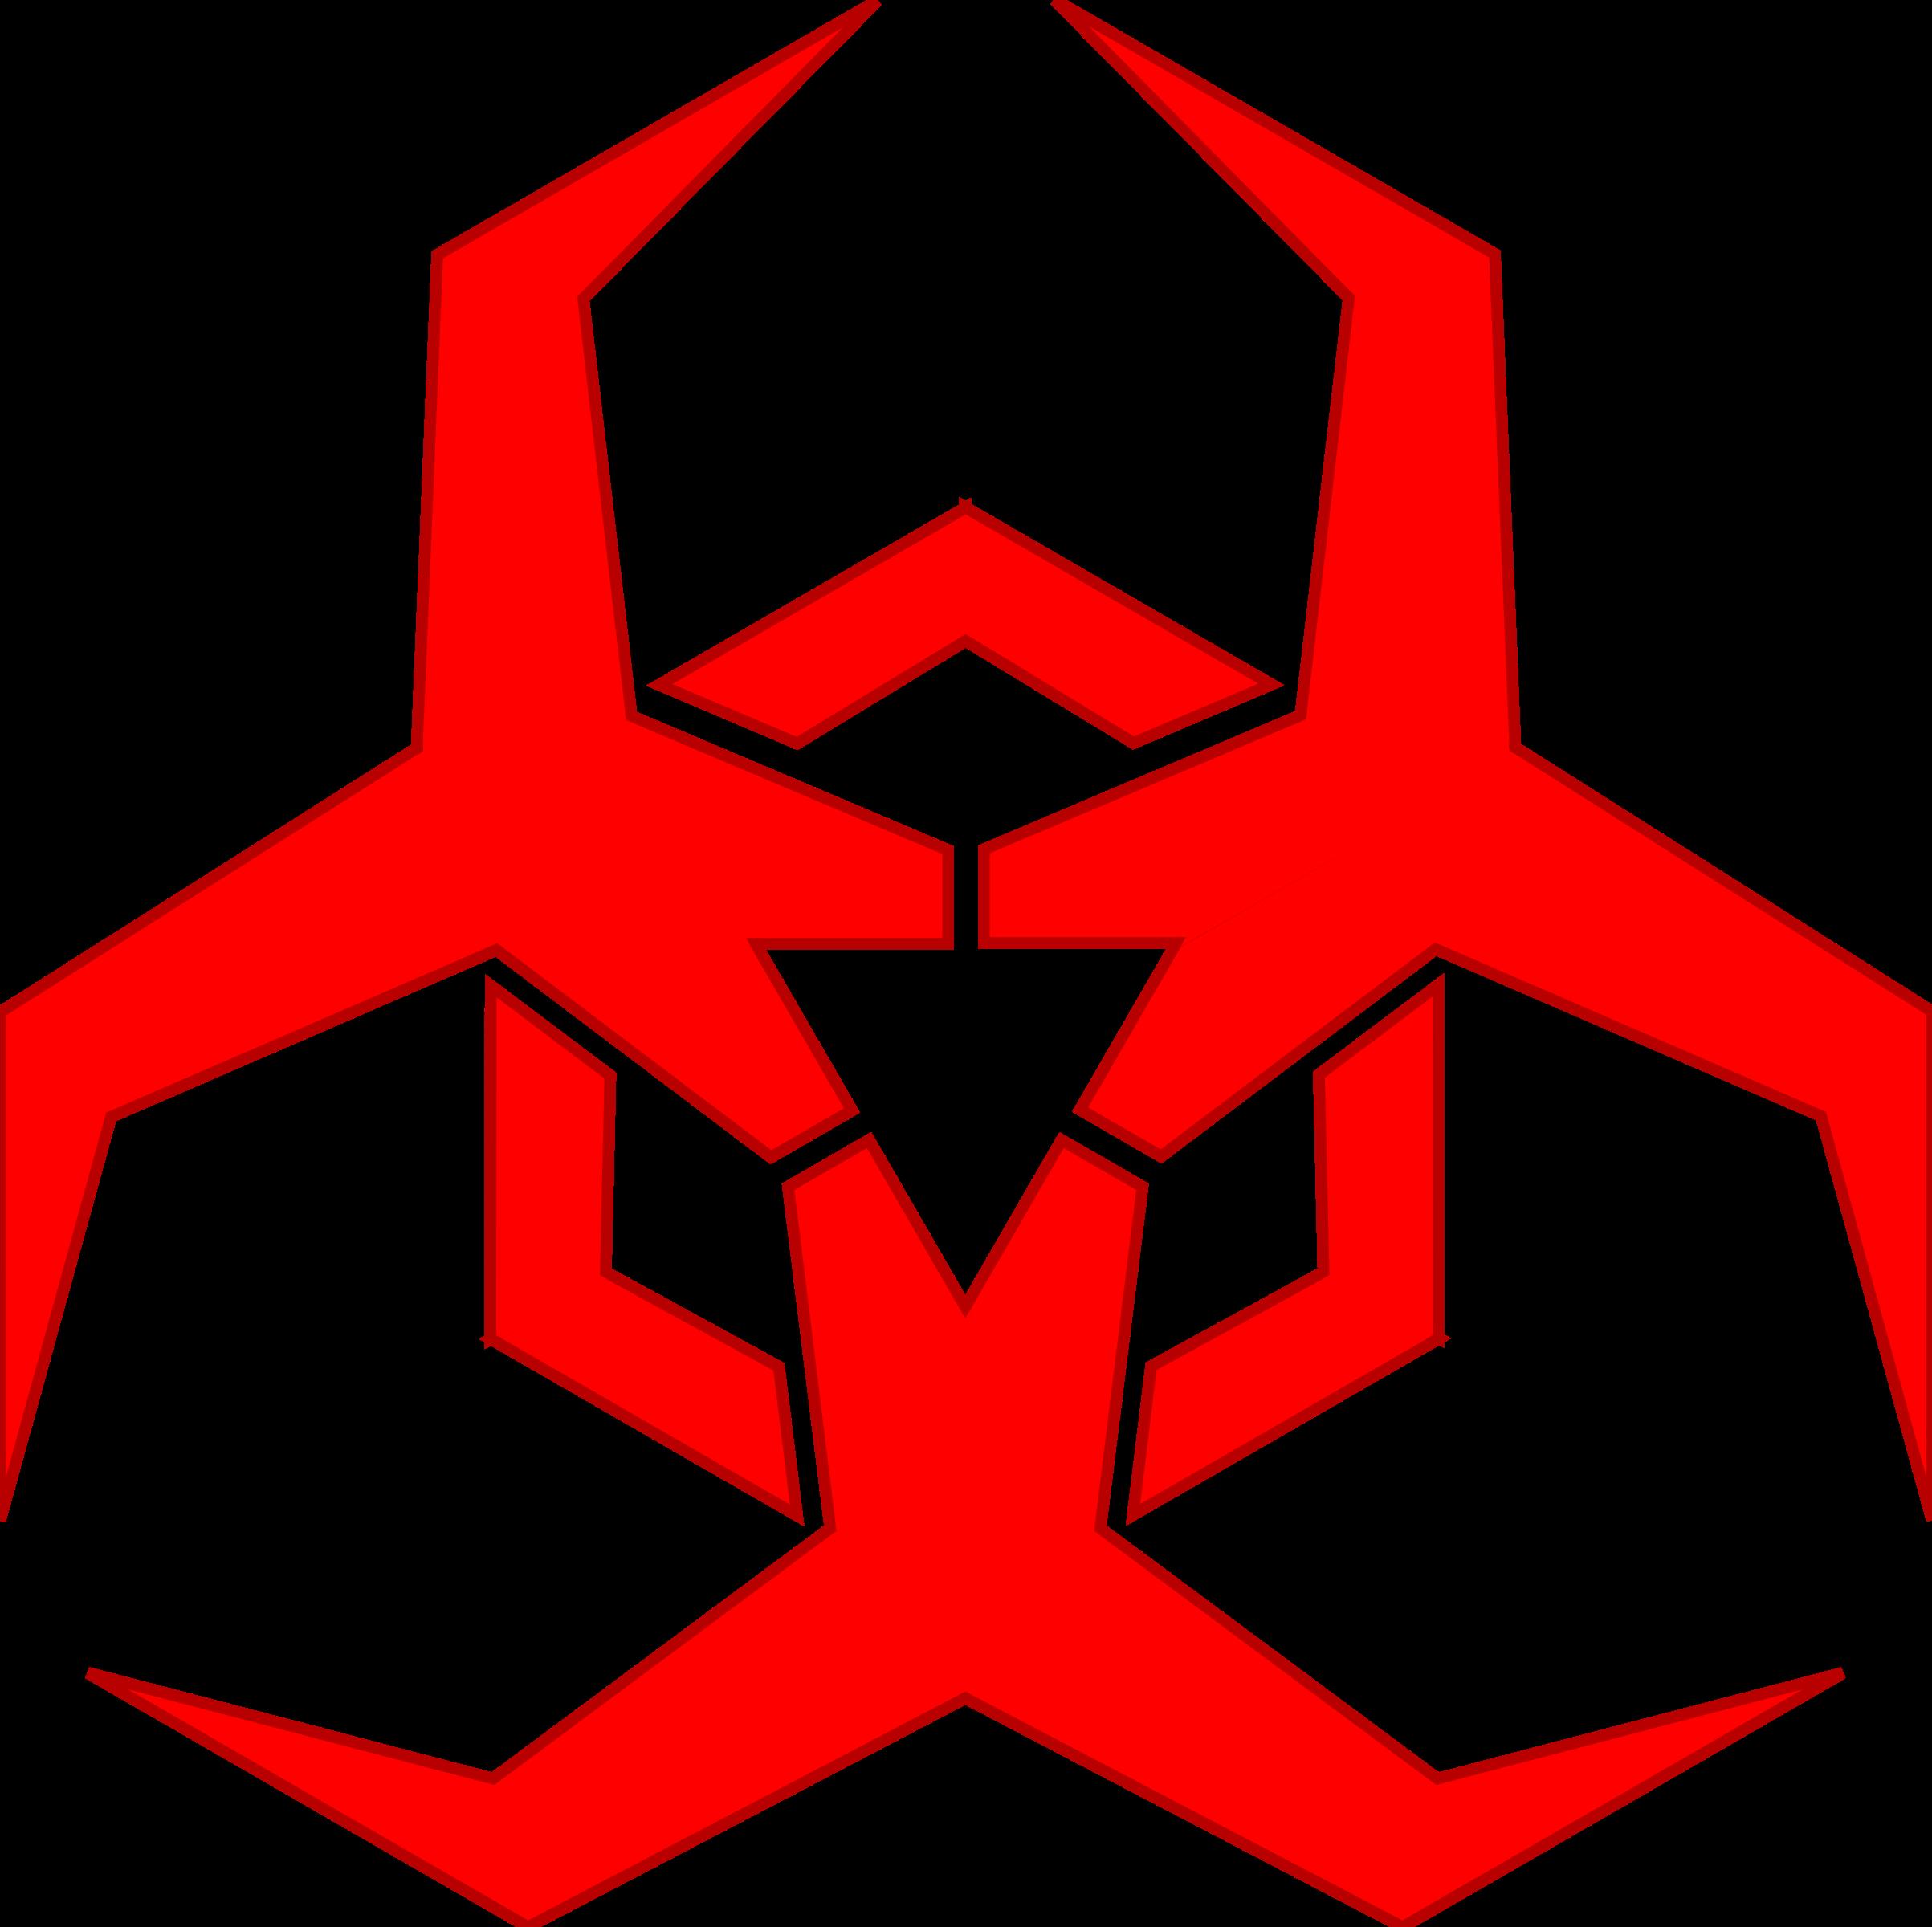 Malware Hazard Symbol Red By Pbcrichton Symbol To Label